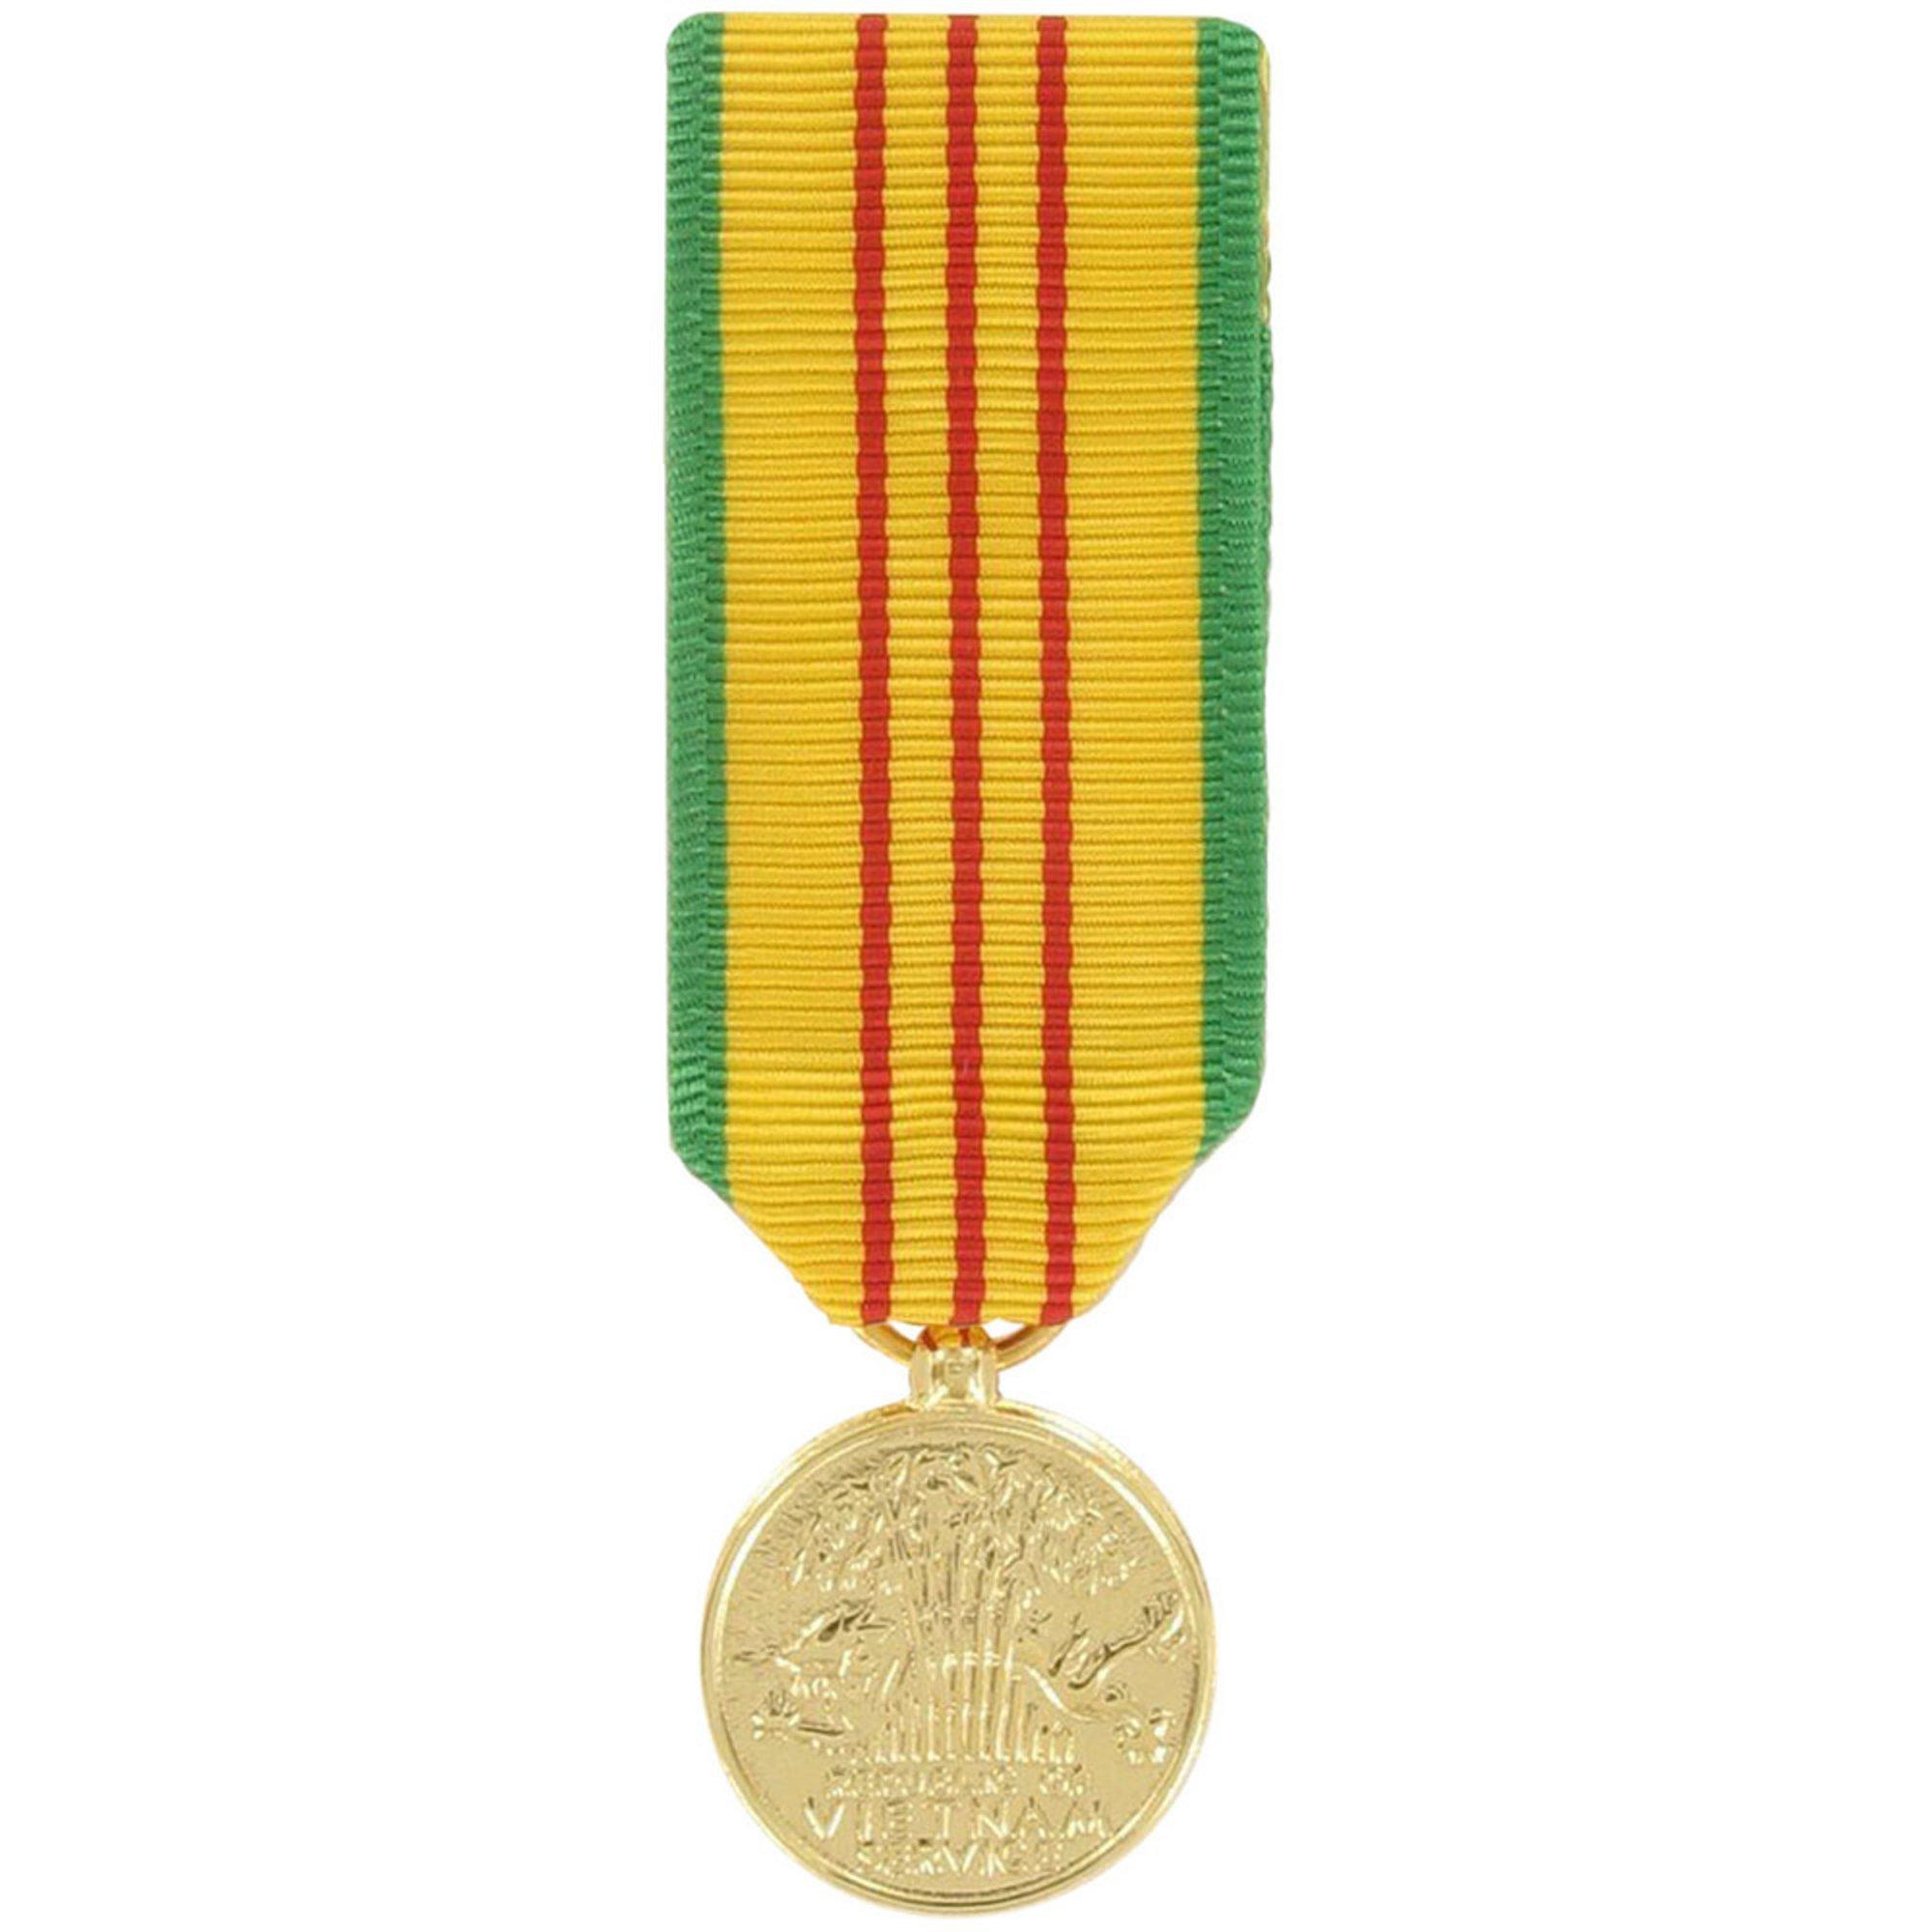 Medal Miniature Anodized Vietnam Service | Anodized Miniature Medals